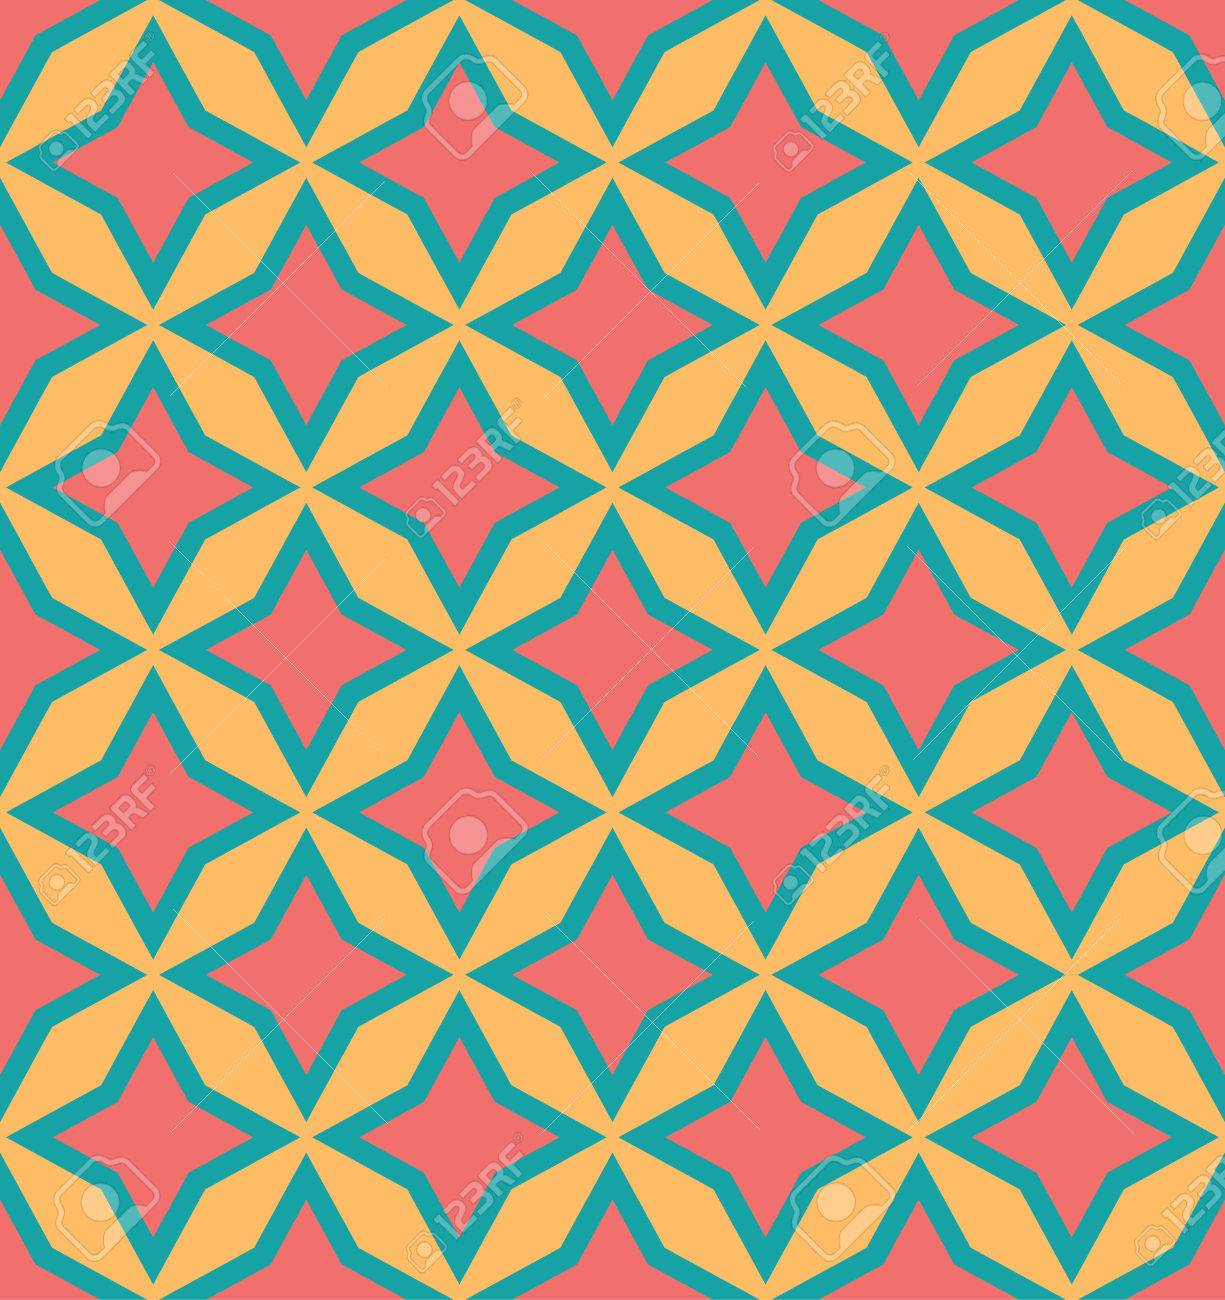 Pattern Geometry Abstract Background Seamless Geometric